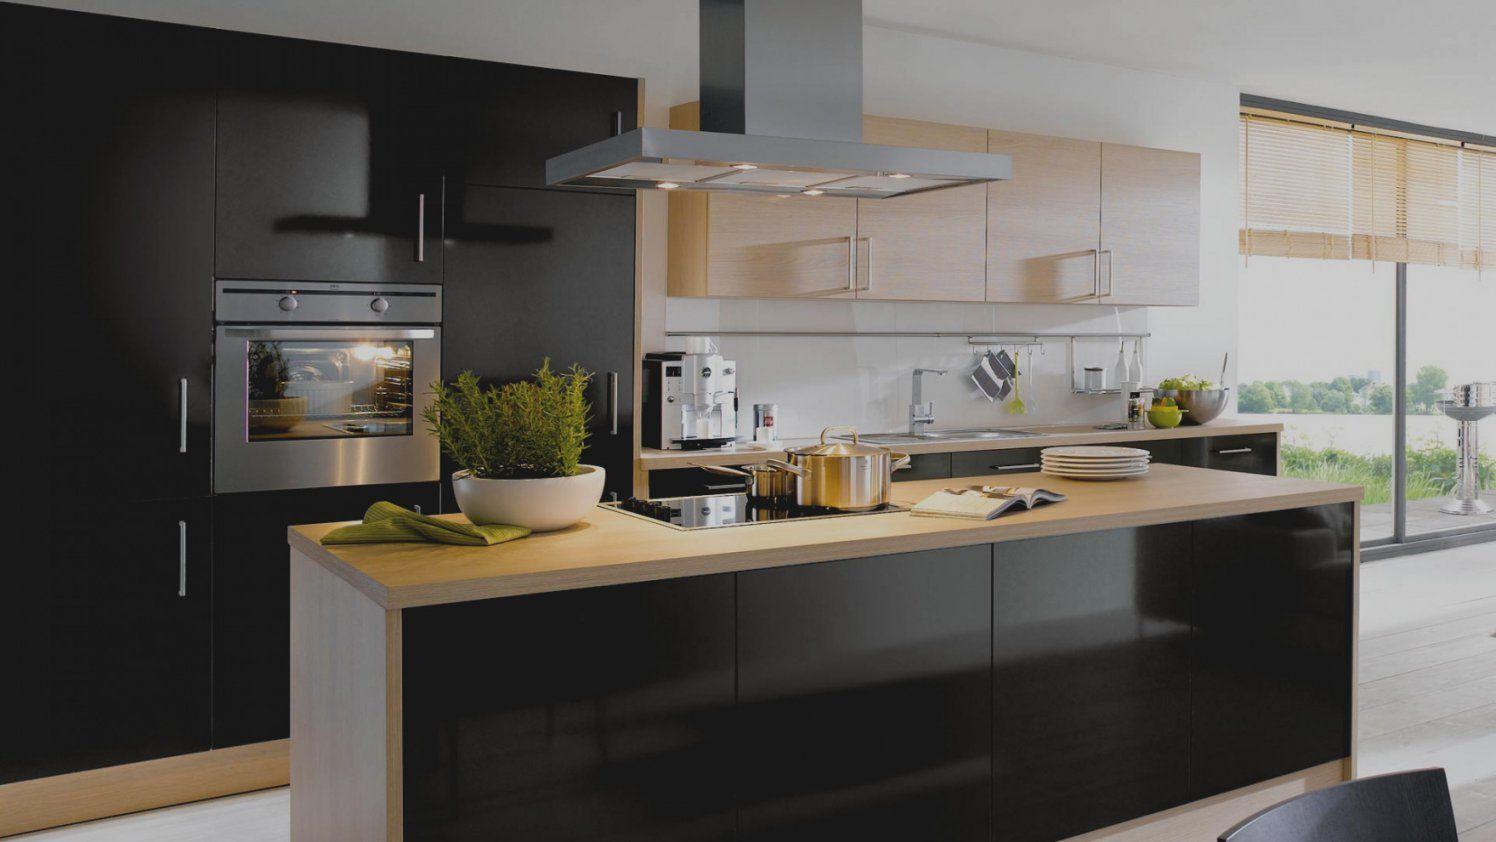 Ikea Kche Mit Kochinsel  Haus Design Ideen